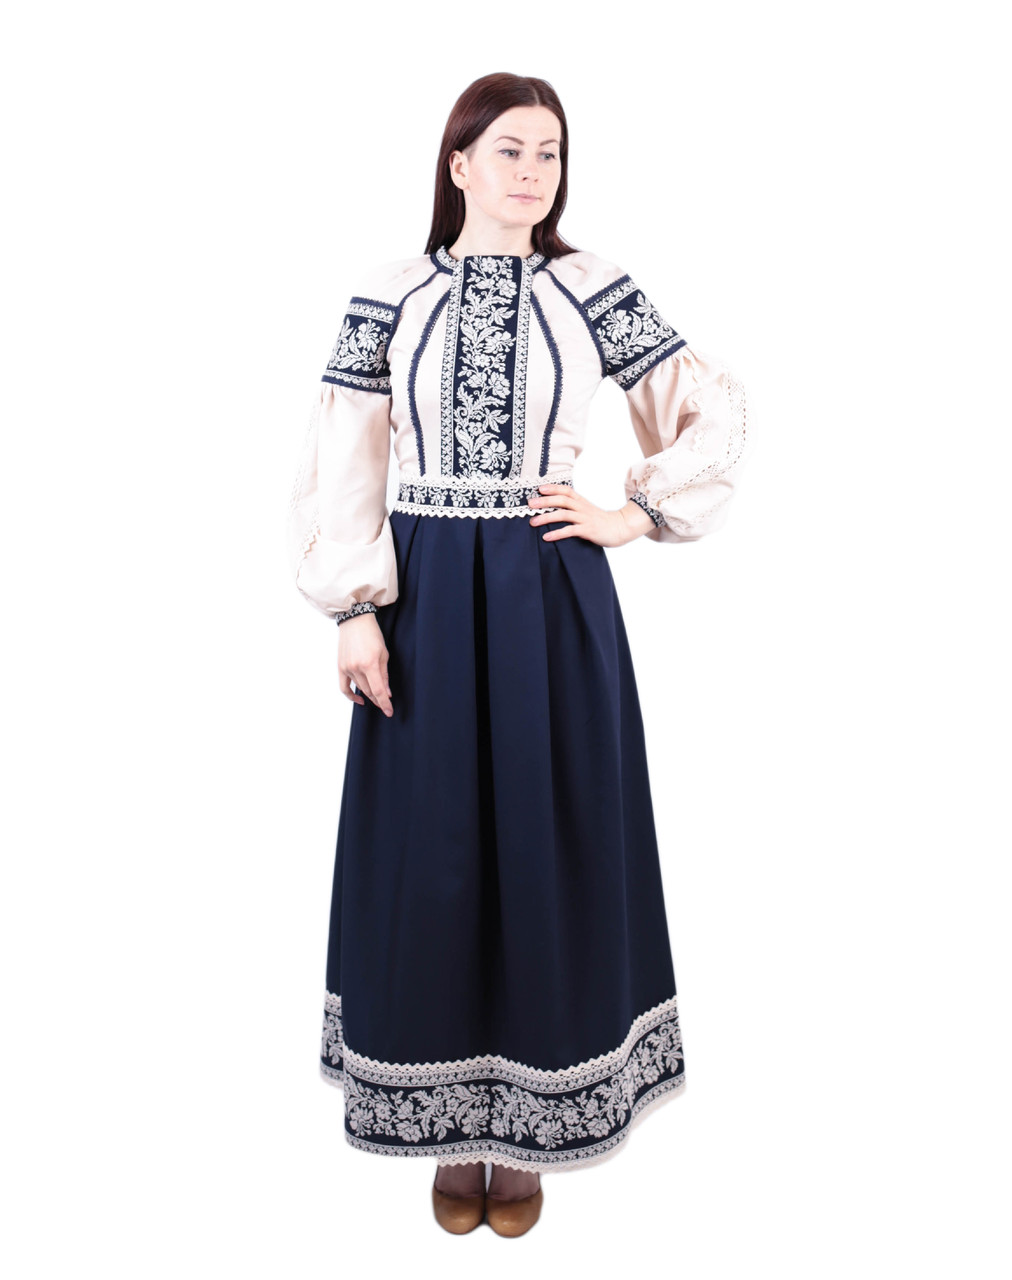 Вишите котонове синьо-бежеве довге плаття з машинною вишивкою